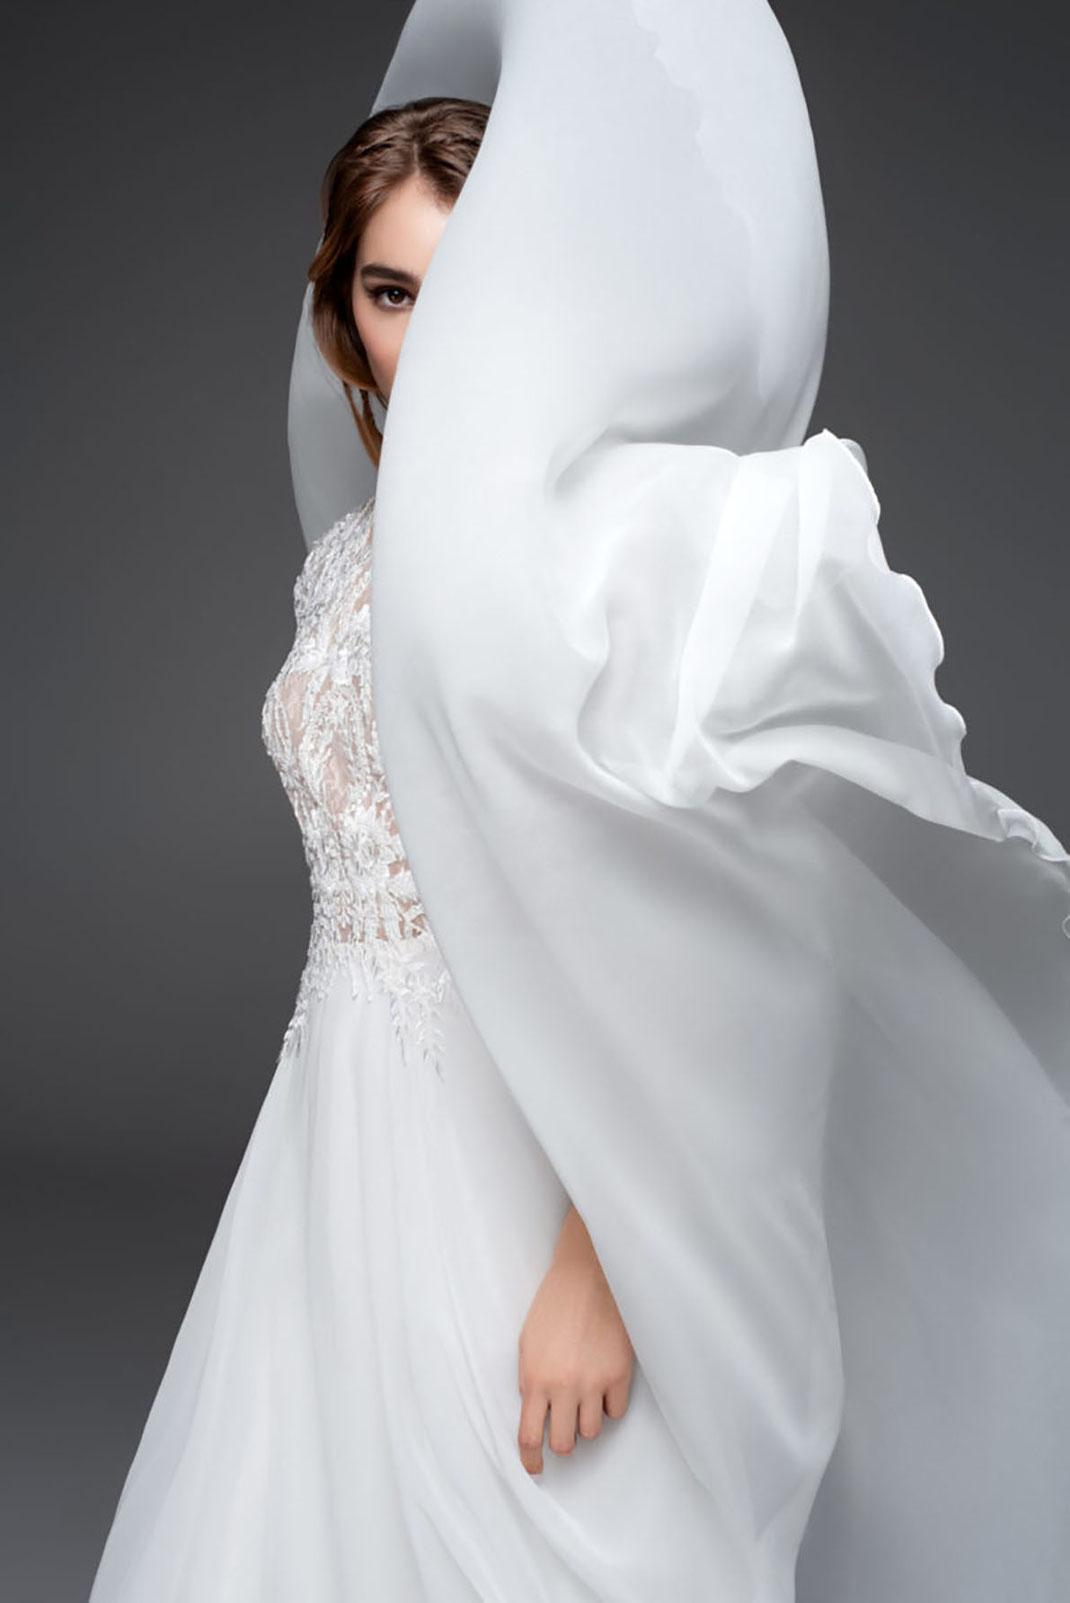 Brautkleider der Sadoni Bridal Kollektion 2022